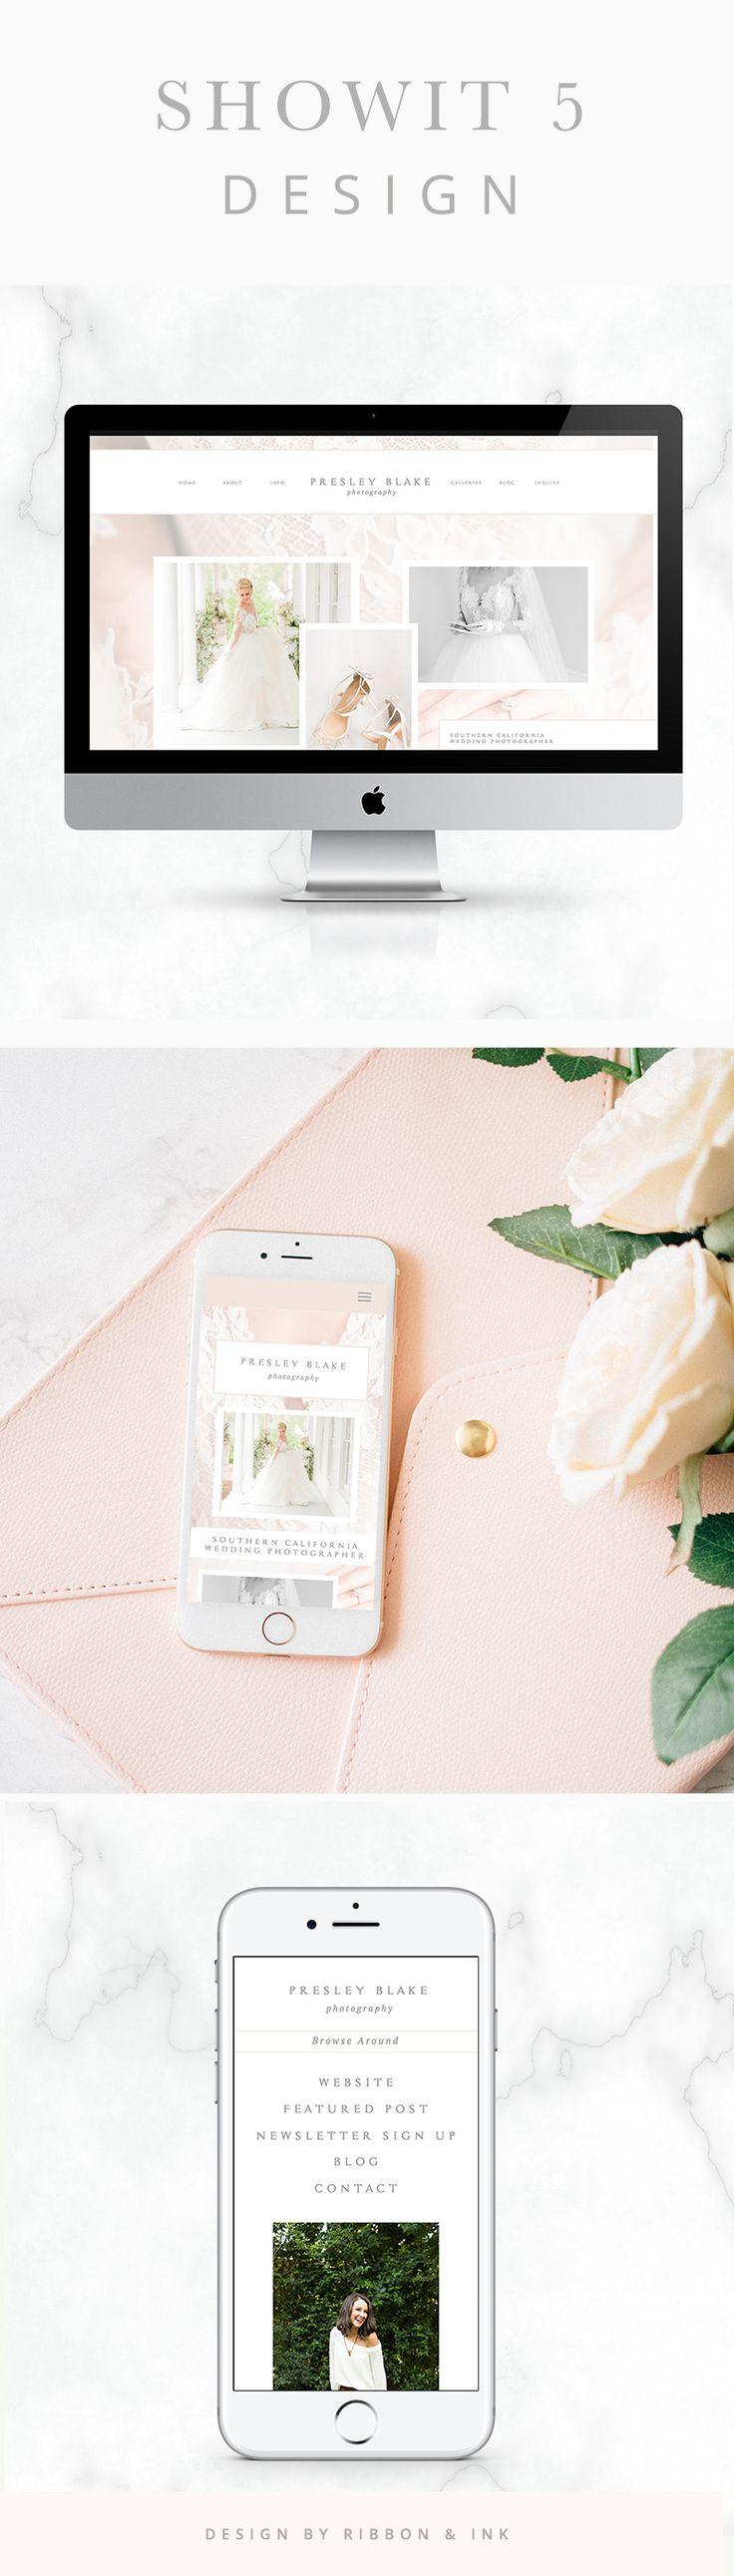 Branding for photographers #brand #brands #branding #logo #logos #design #webdesign #website #photographer #photography #event #planner #planning #wedding #blog #pretty #romantic #beautiful #font #inspiration #color / brand design / brand idea / color palette / web design / brand designer / brand inspiration